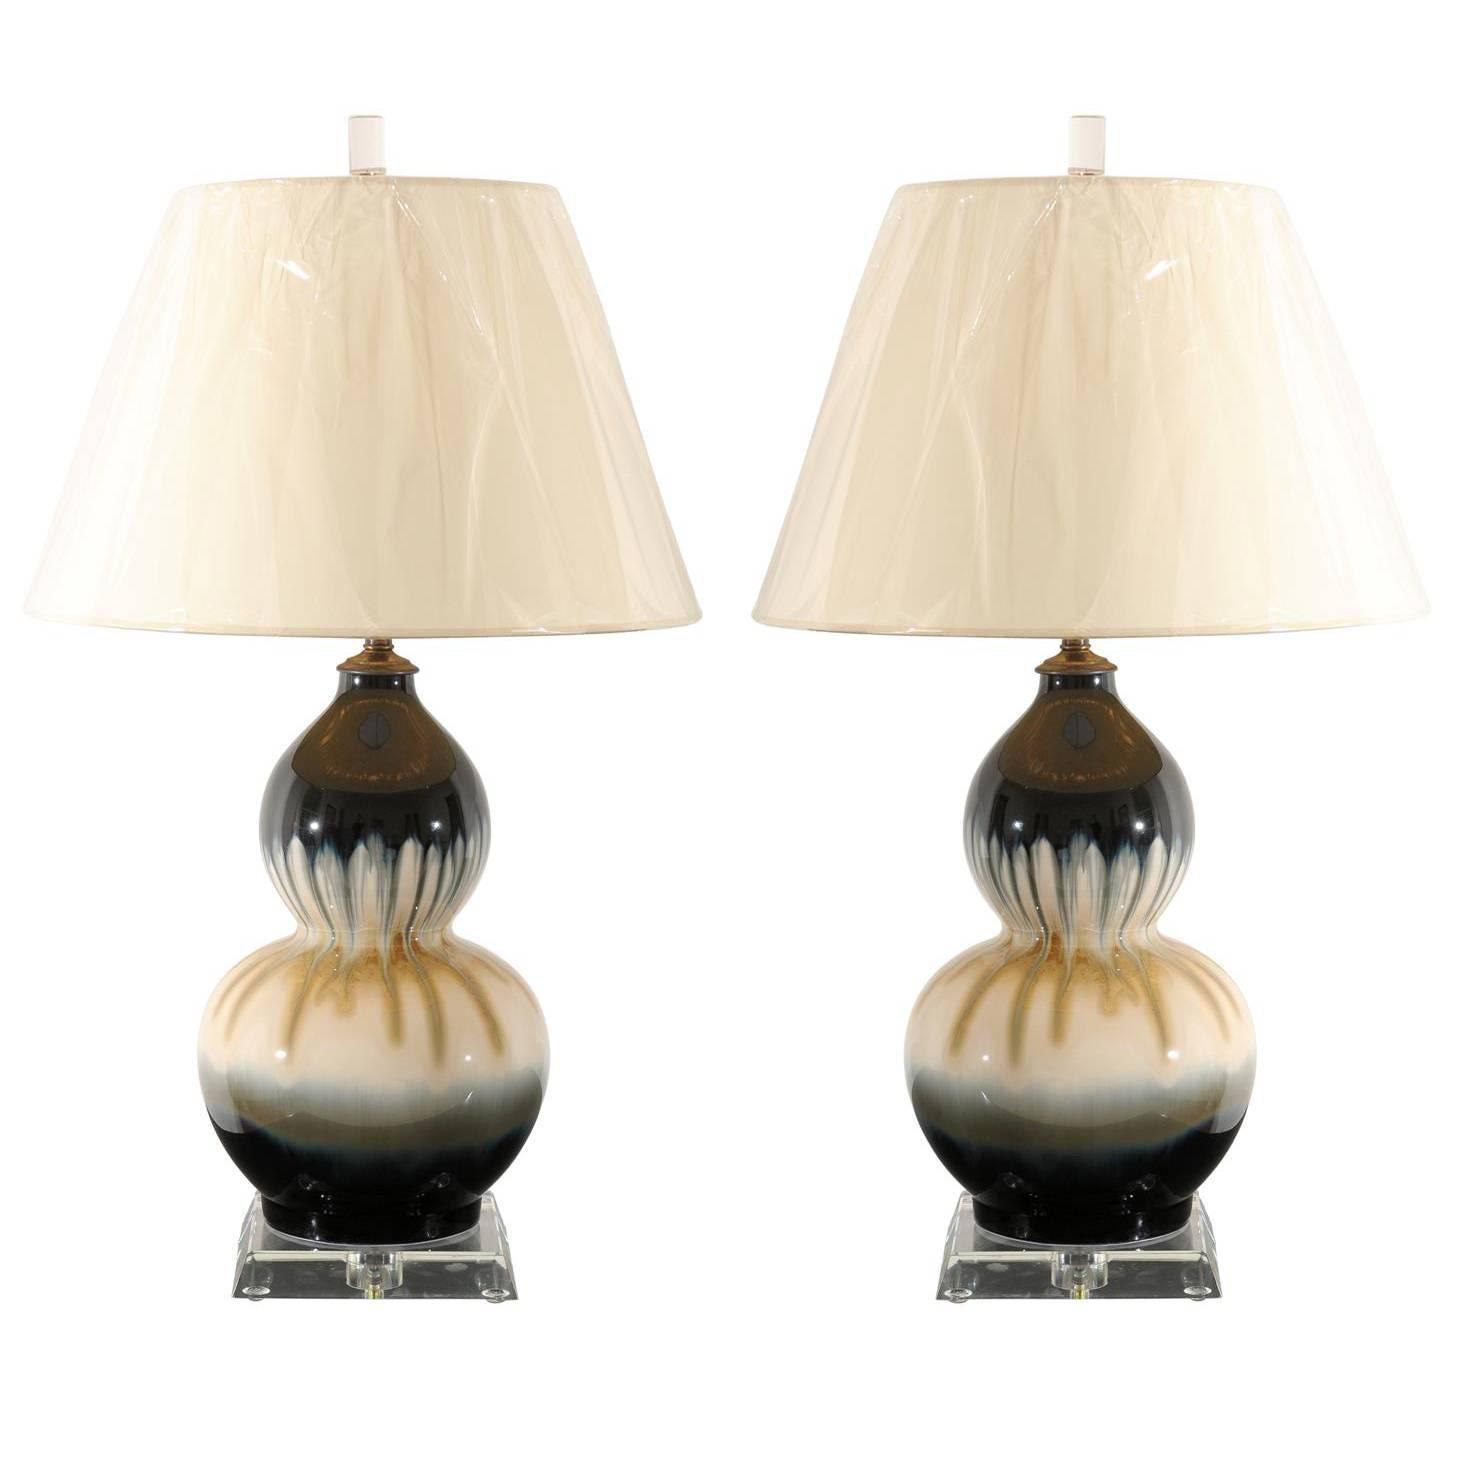 Elegant Pair of Drip Glaze Ceramic Double Gourd Lamps